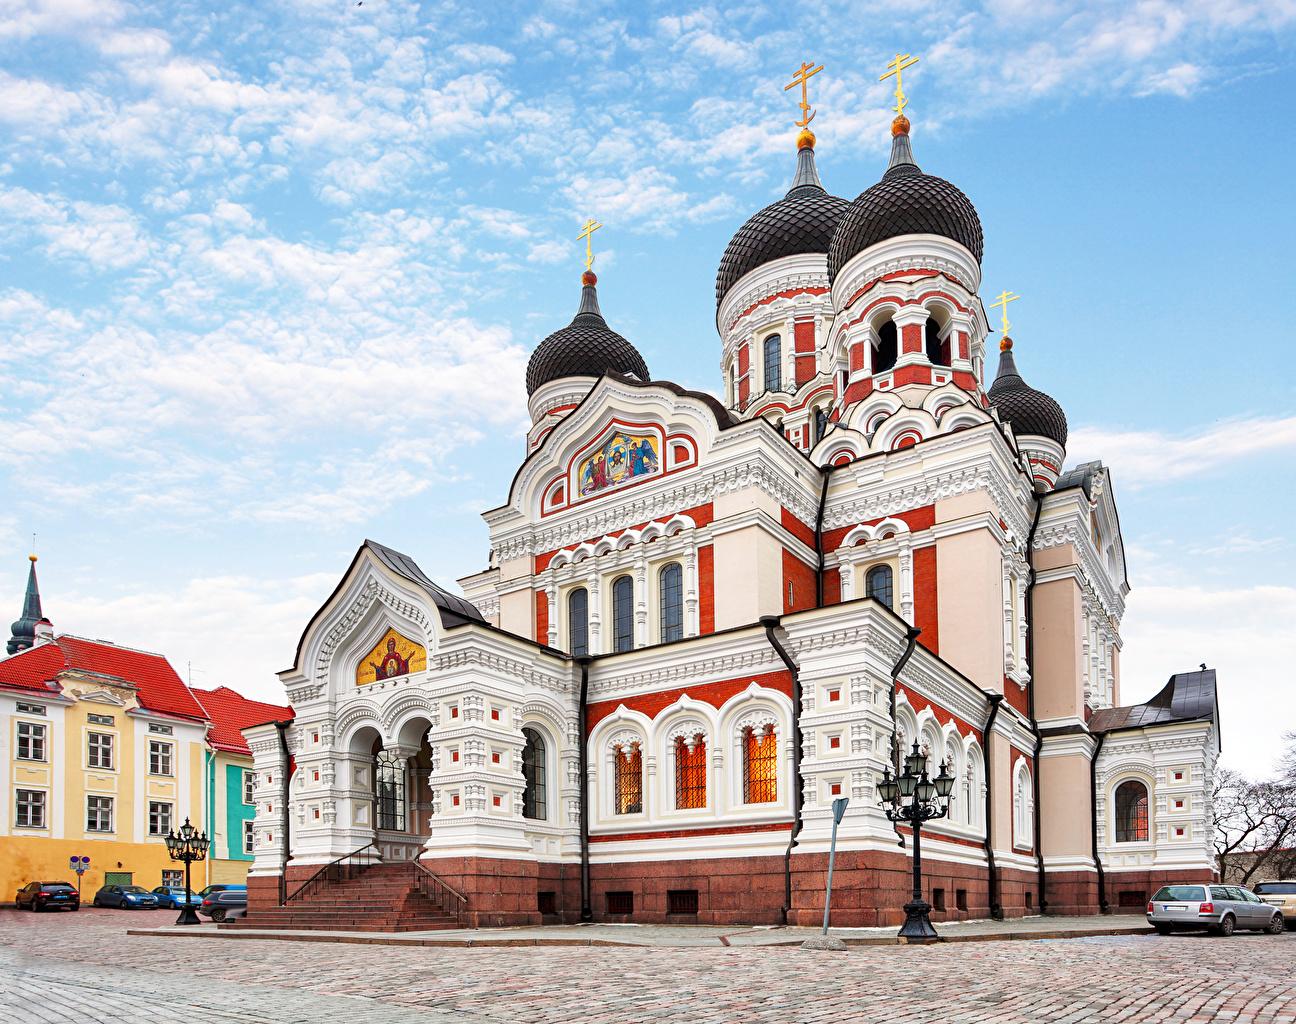 Фото Таллин Собор Эстония Alexander Nevsky Cathedral Храмы Города Дизайн